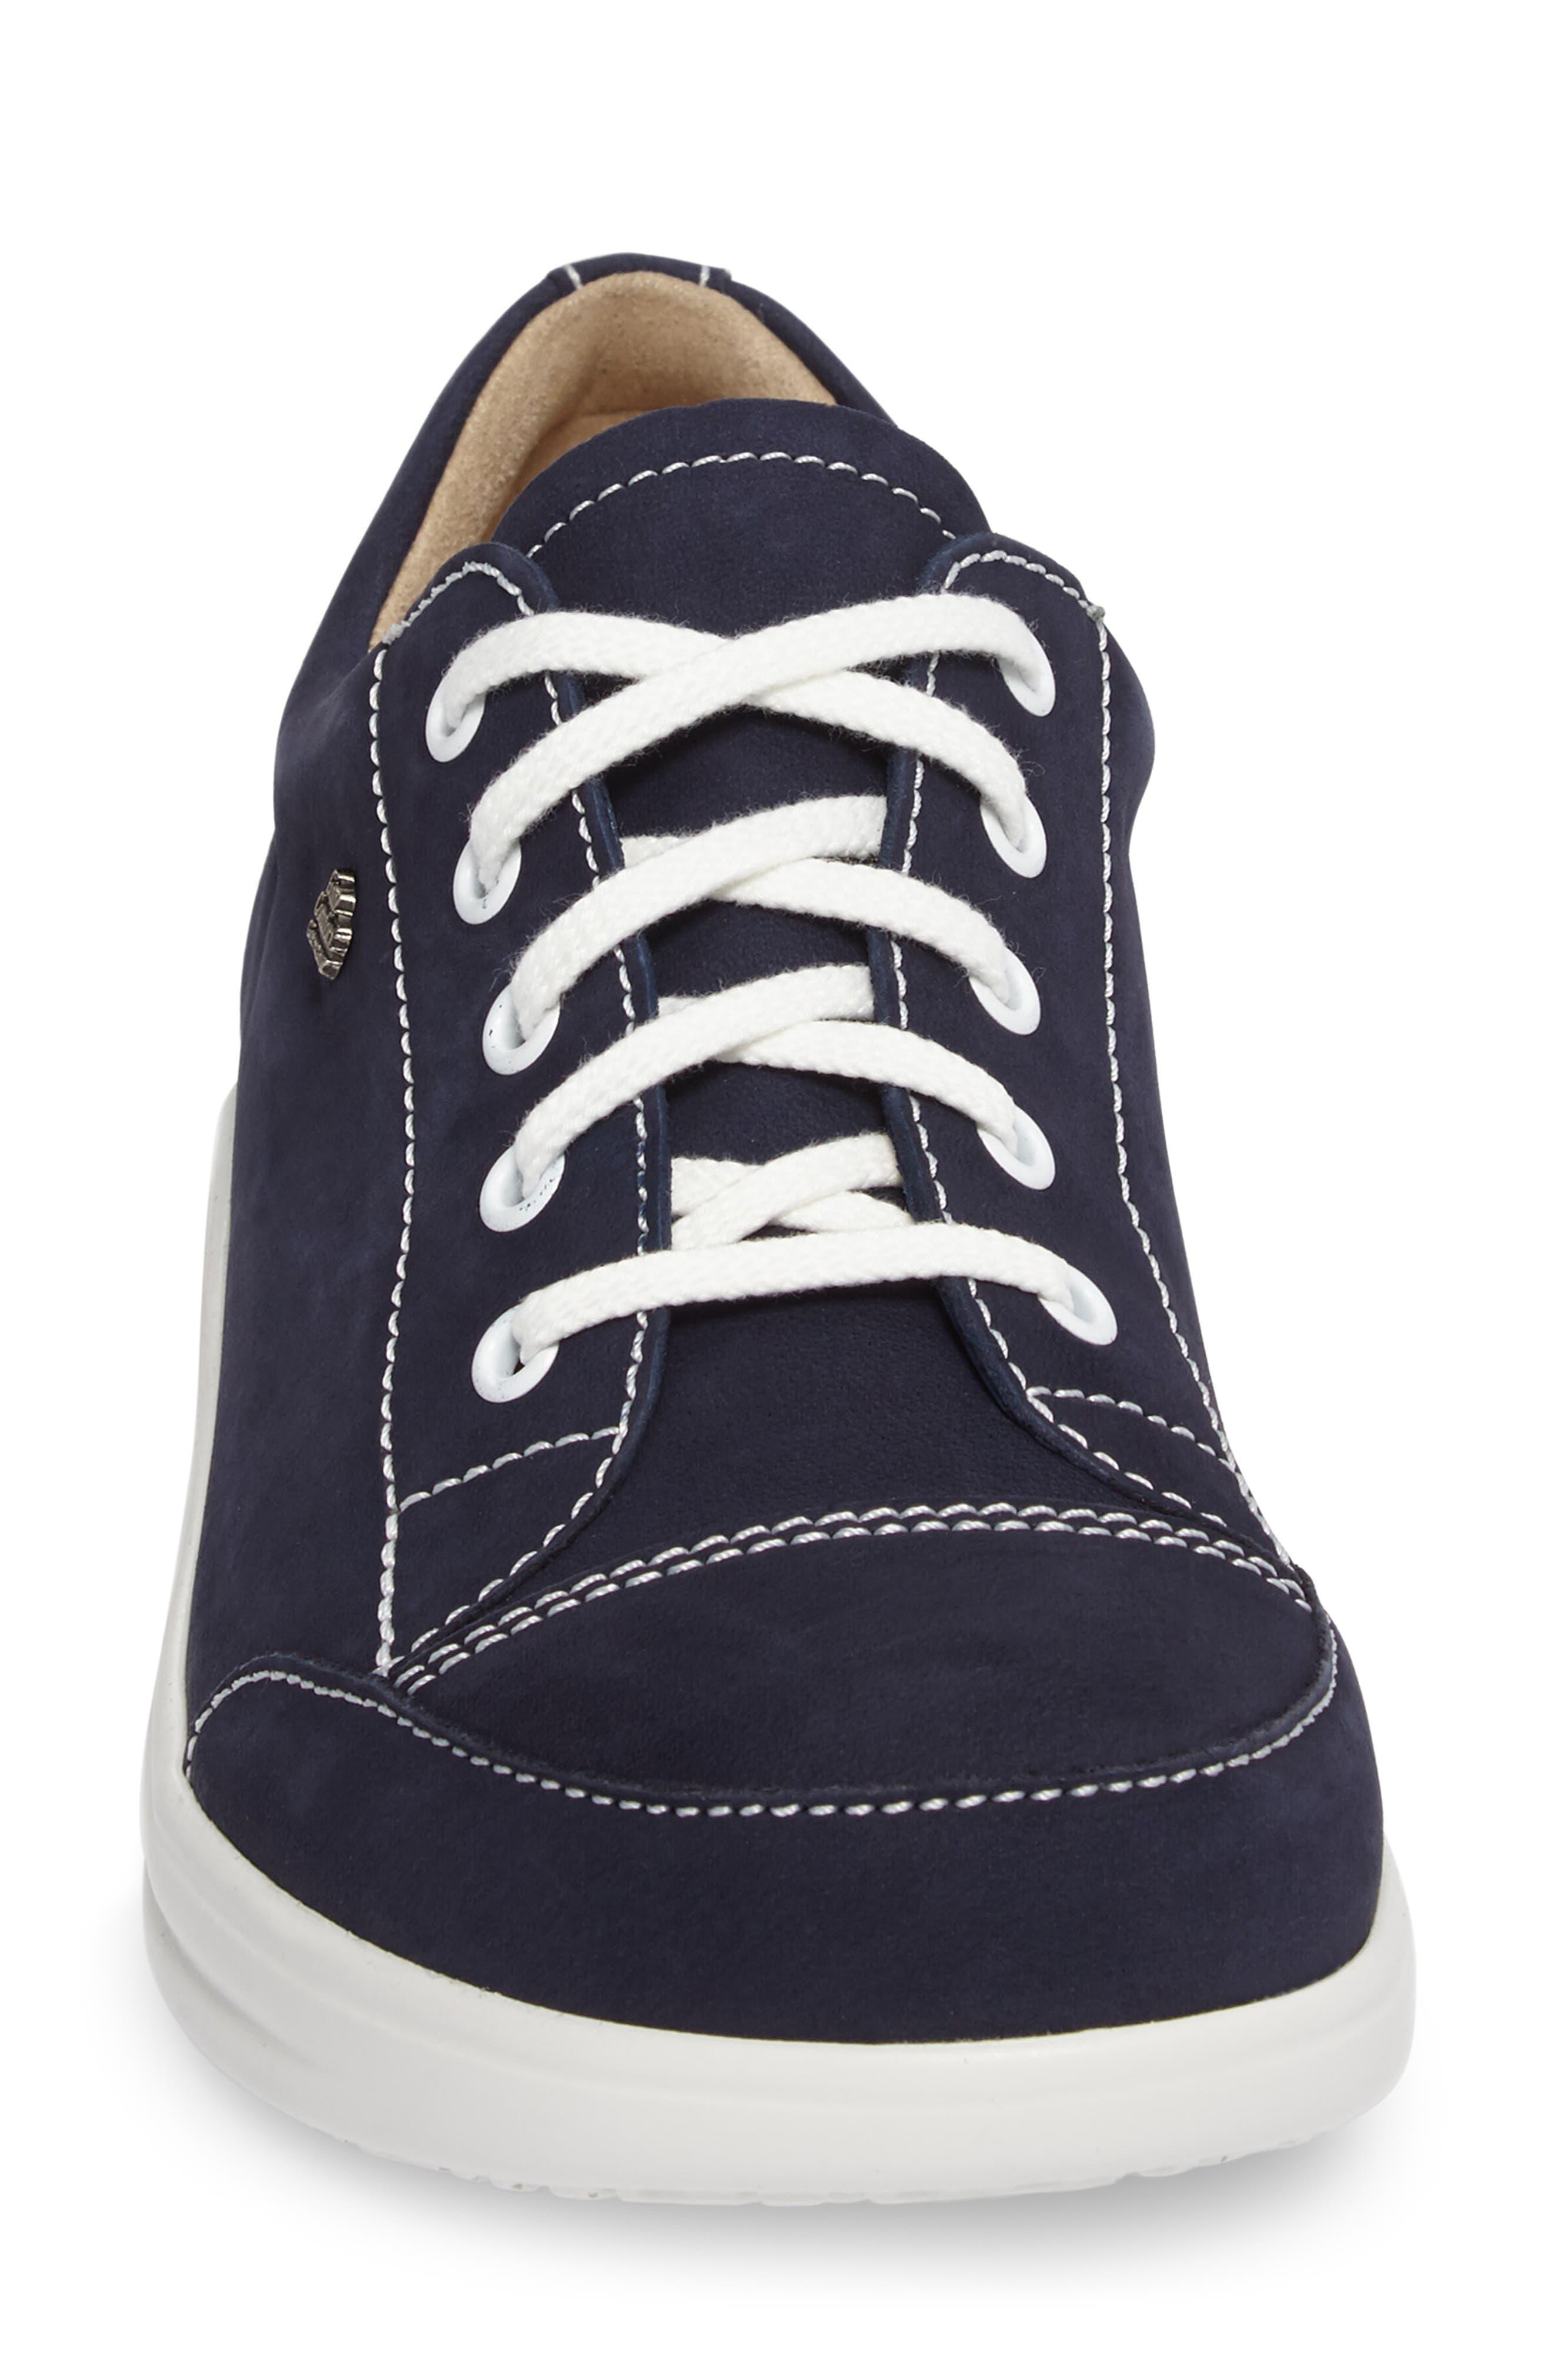 FINNAMIC by Finn Comfort 'Ikebukuro' Walking Shoe,                             Alternate thumbnail 4, color,                             Atlantic Leather